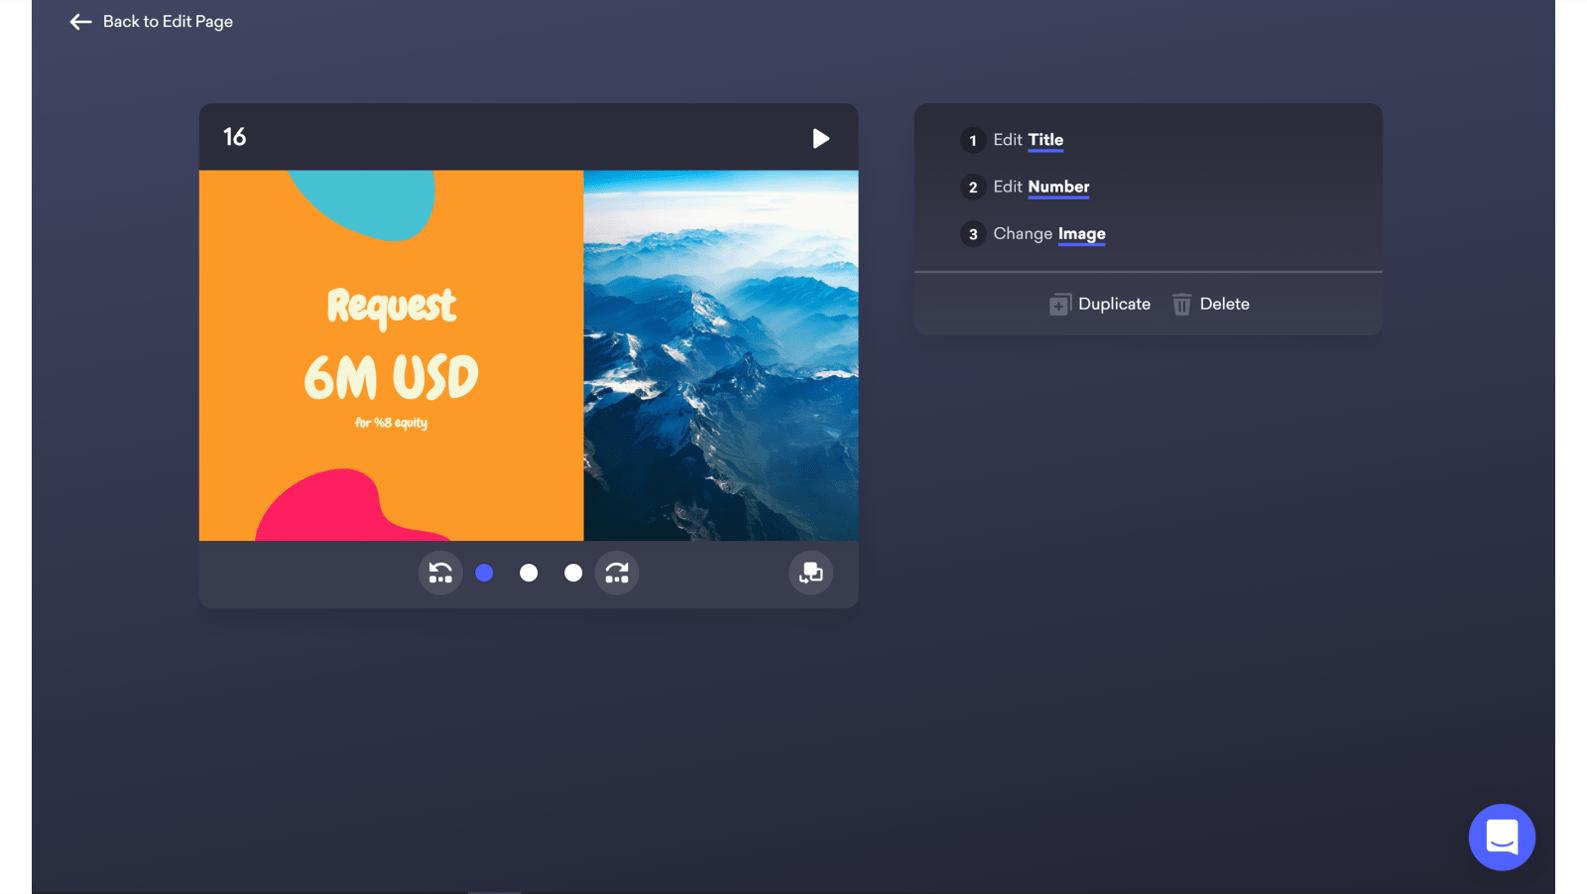 screenshot of the Focus Mode in decktopus